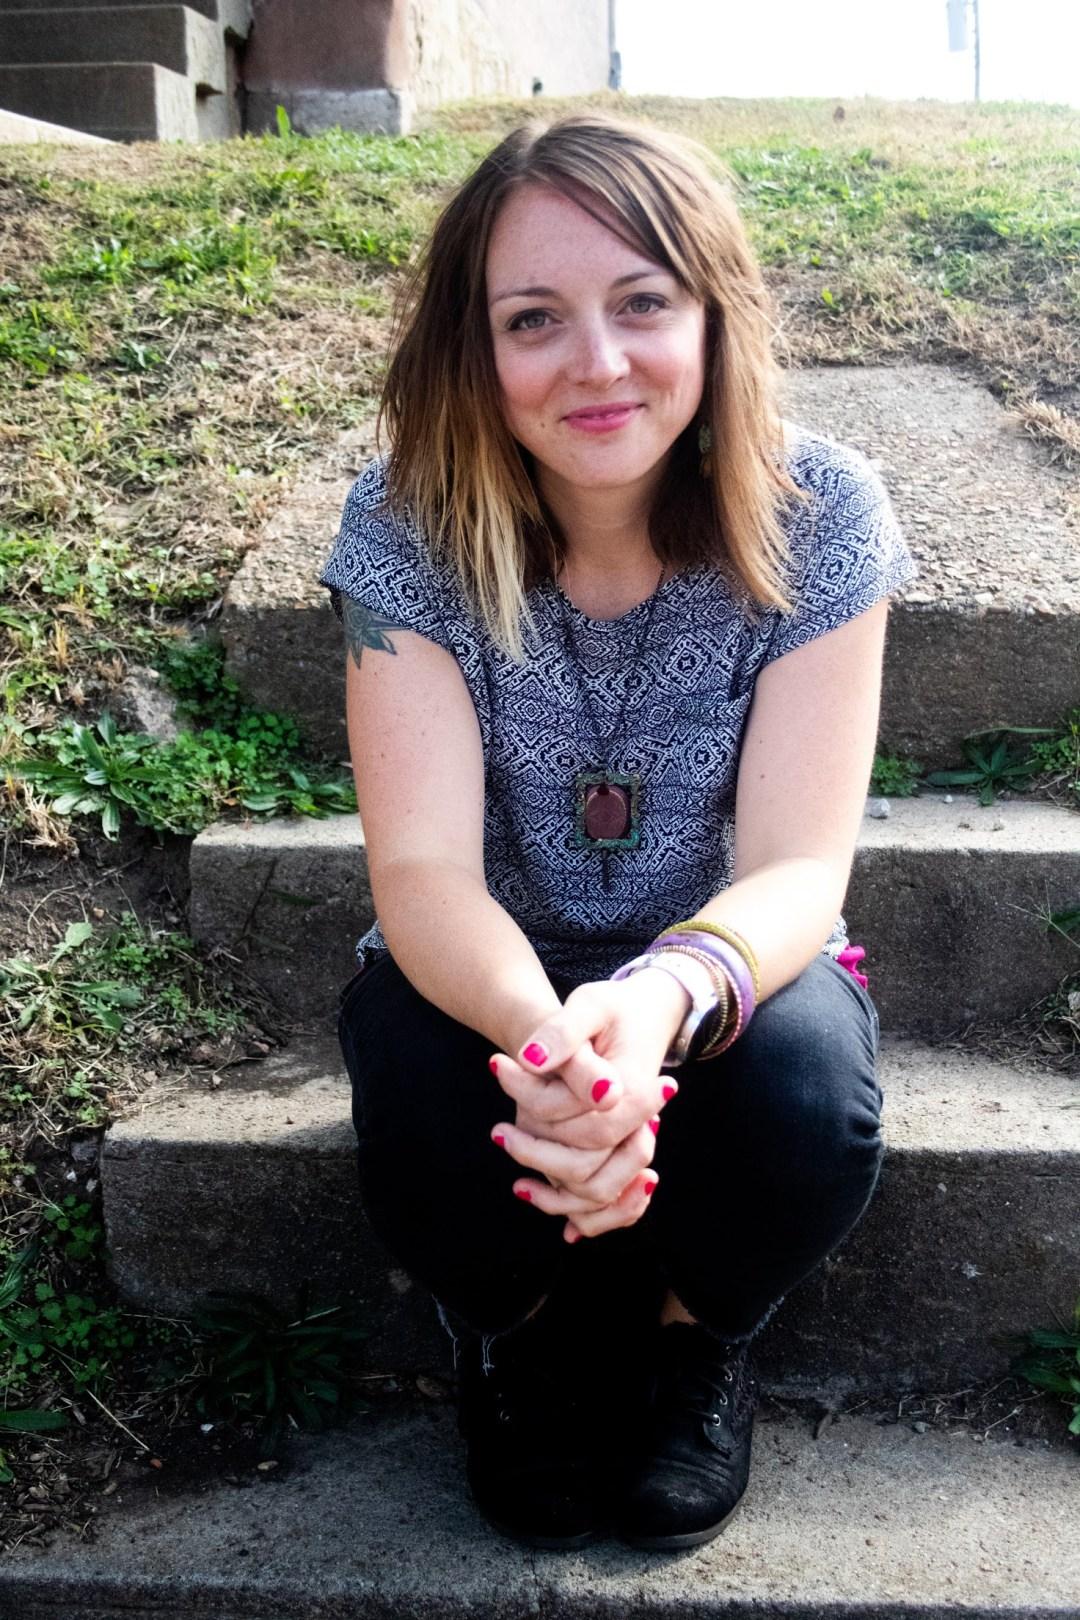 Natalie Coriell